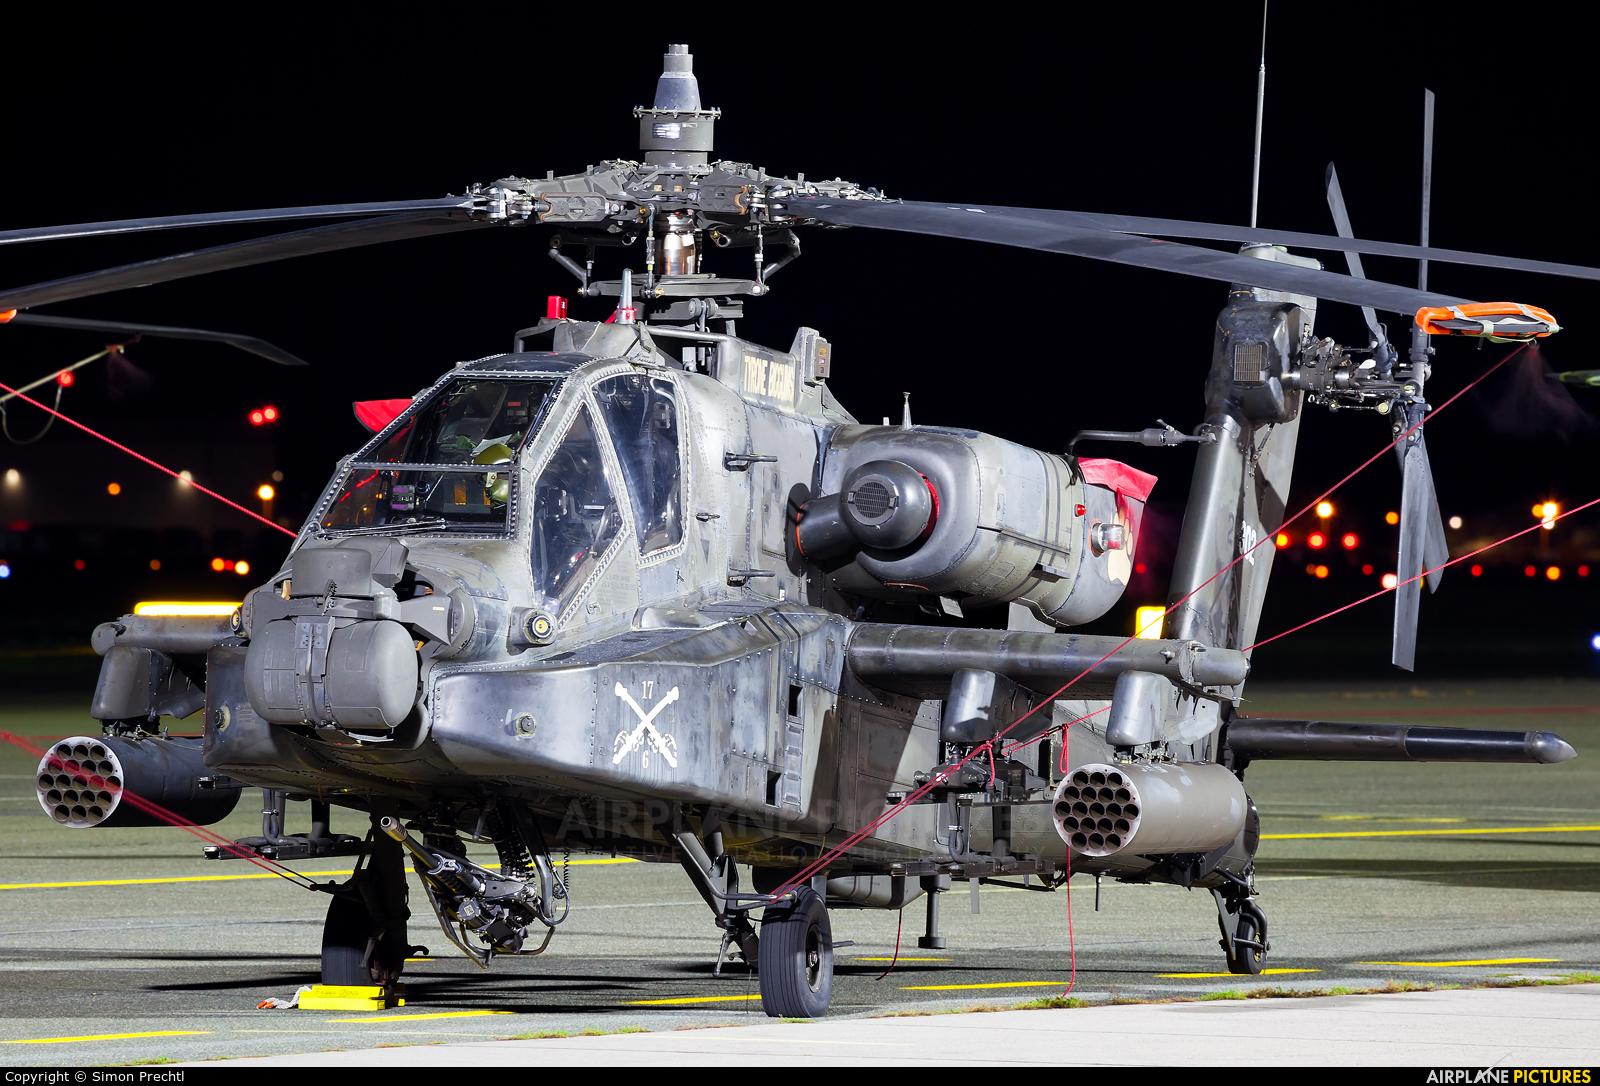 USA - Army 02-05302 aircraft at Linz